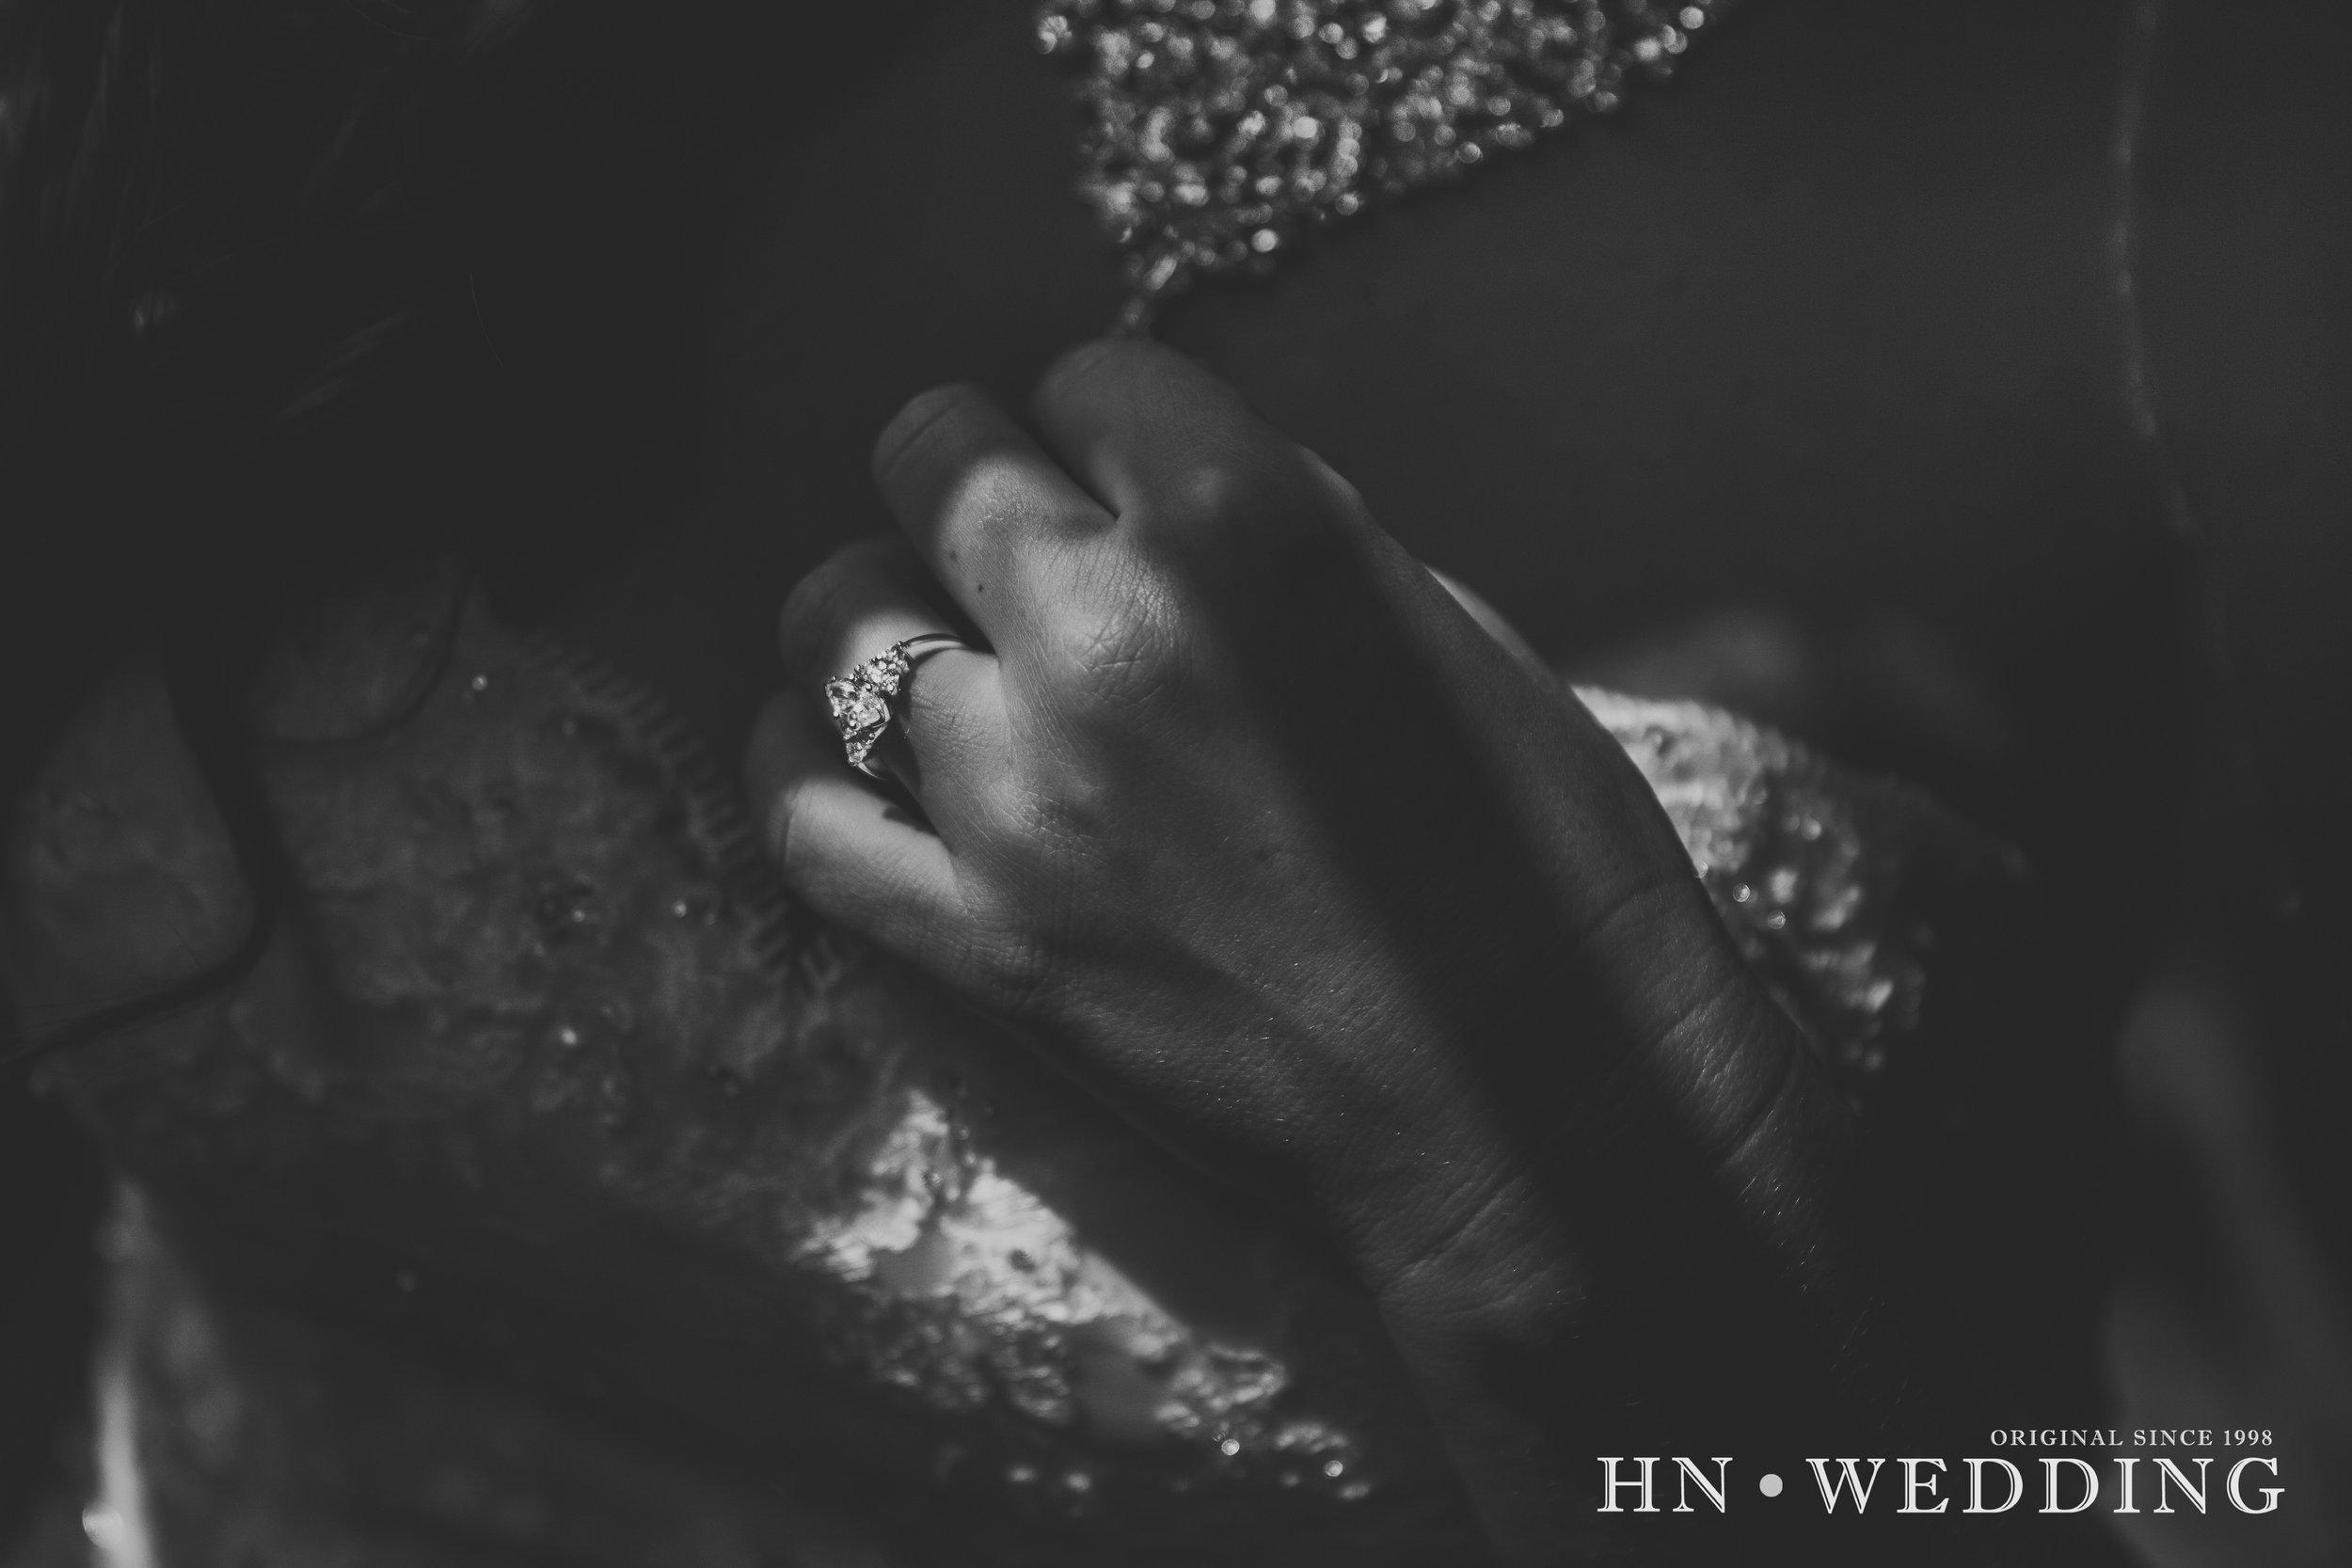 hnwedding20170806weddingday-18.jpg